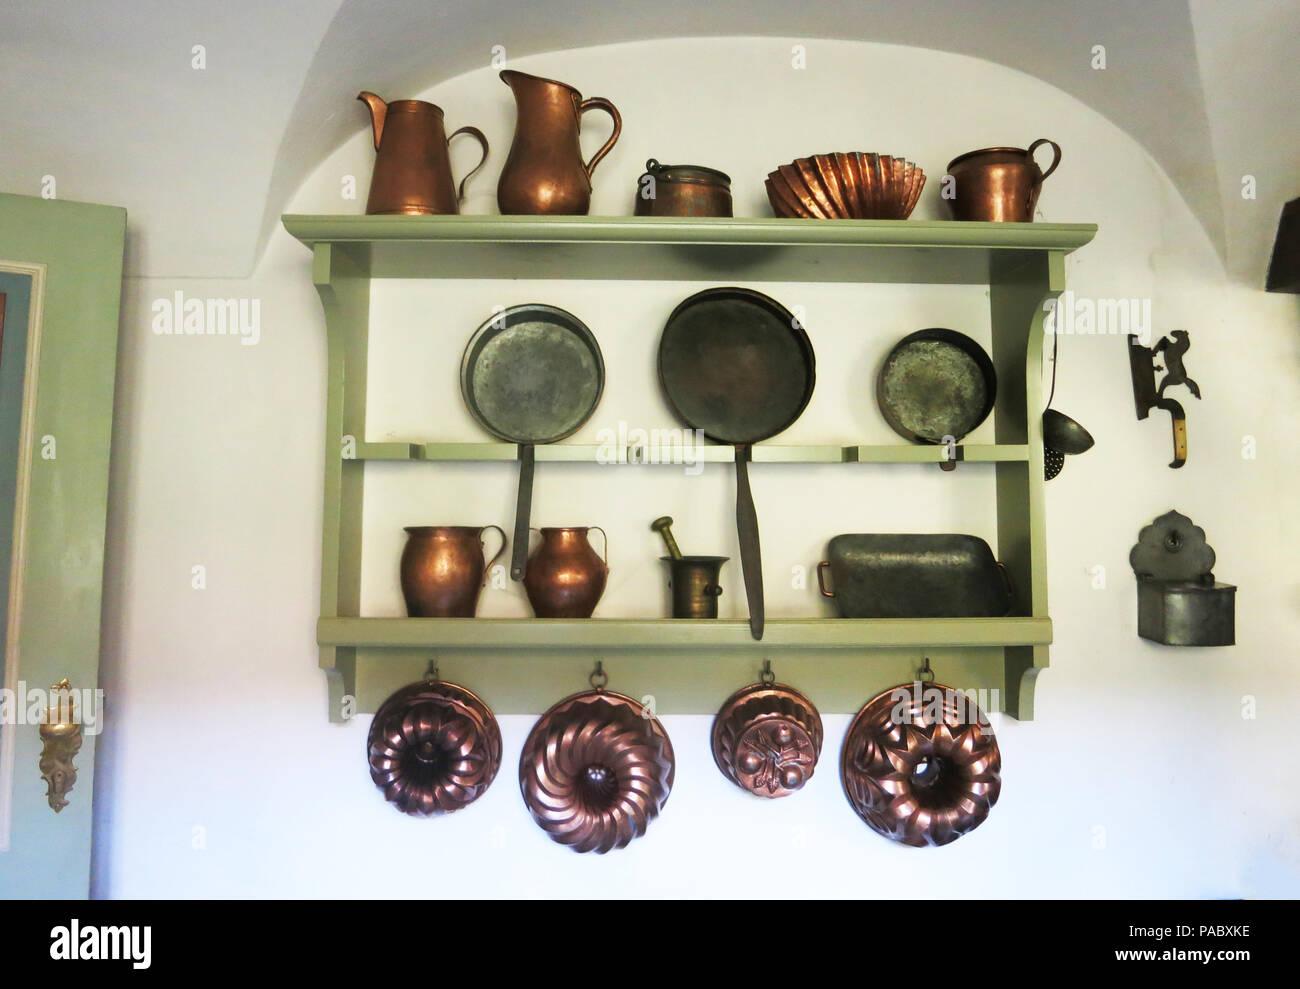 Outil de cuisine, Uphagen's House, musée, Długa, Gdańsk, occidentale, Pologne Banque D'Images